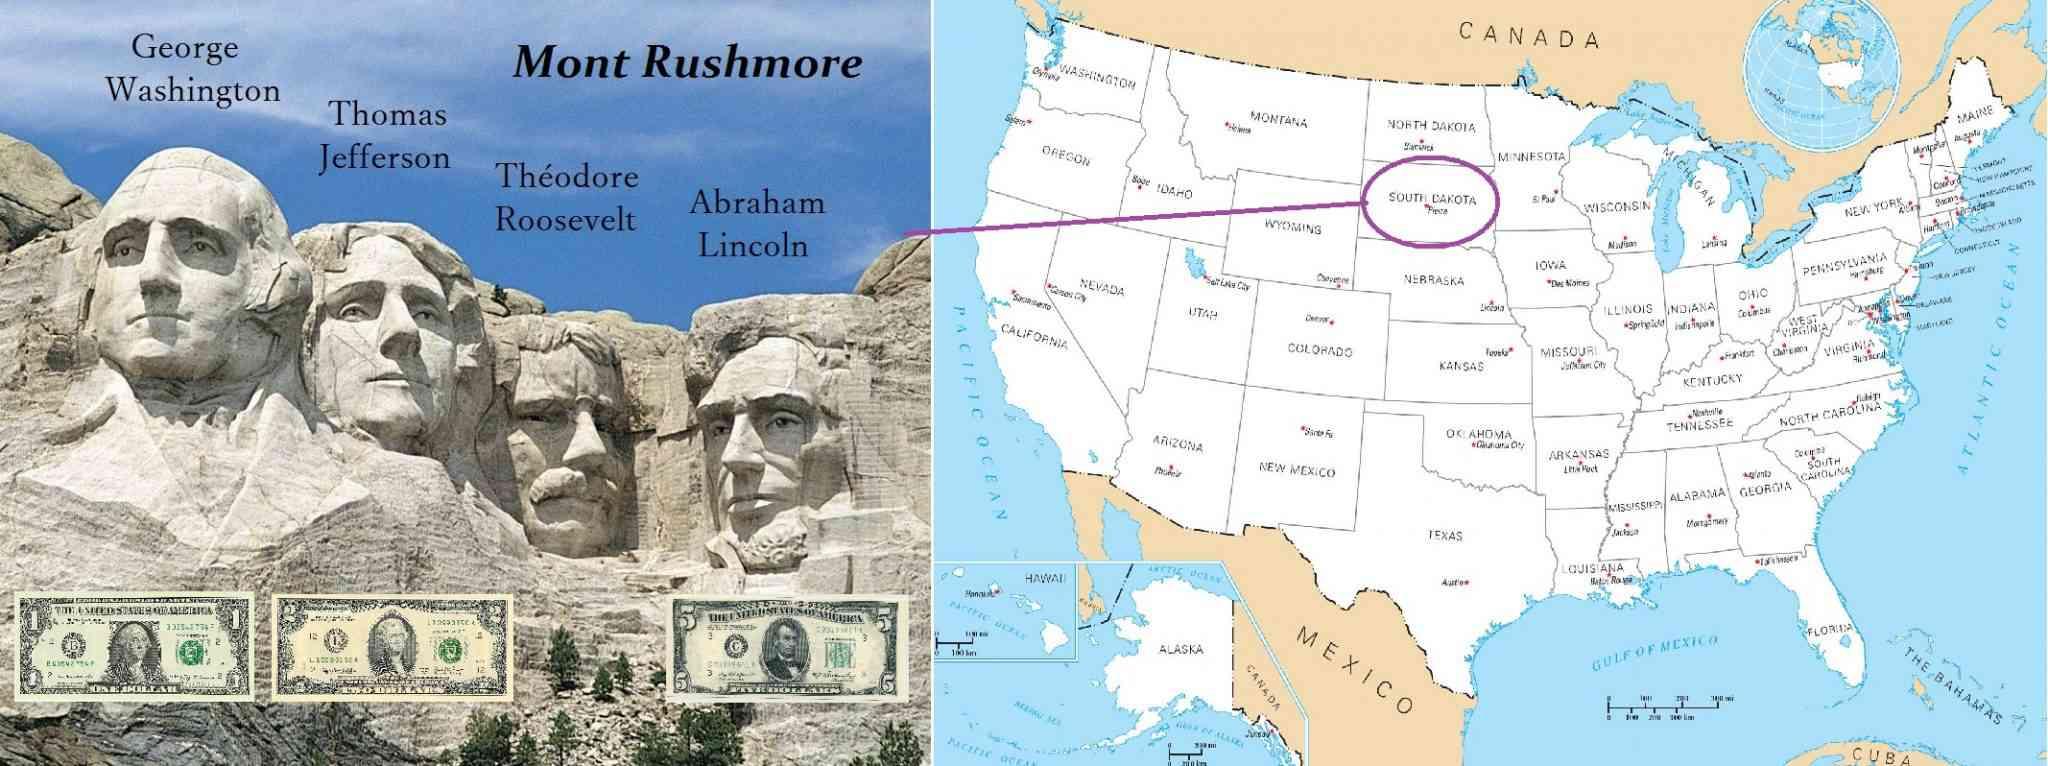 Mont_Rushmore_dakota_du_sud